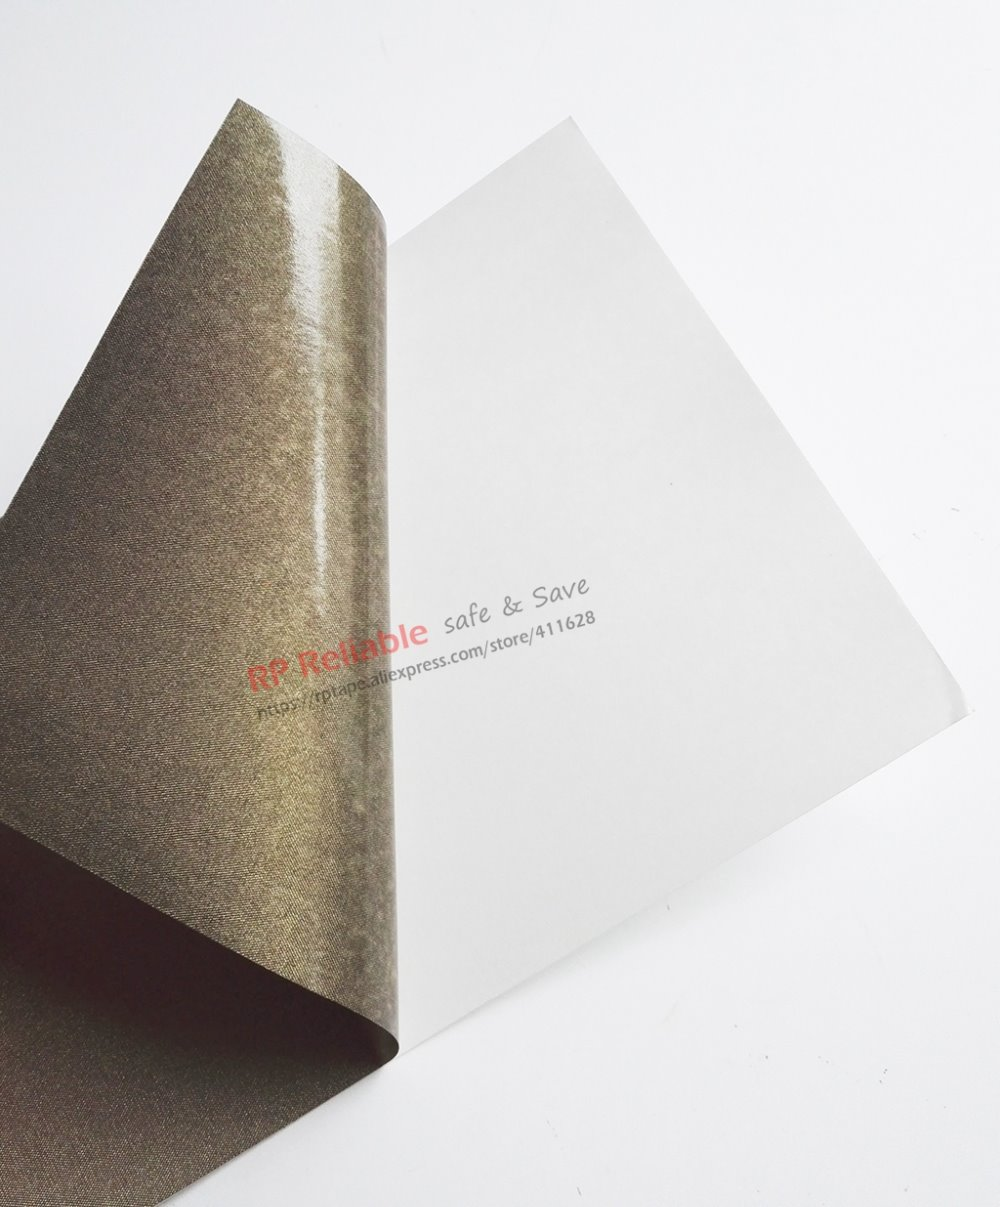 Single Adhesive Conductive Cloth Fabric Tape for LCD Keyboard EMI Shield 100mm